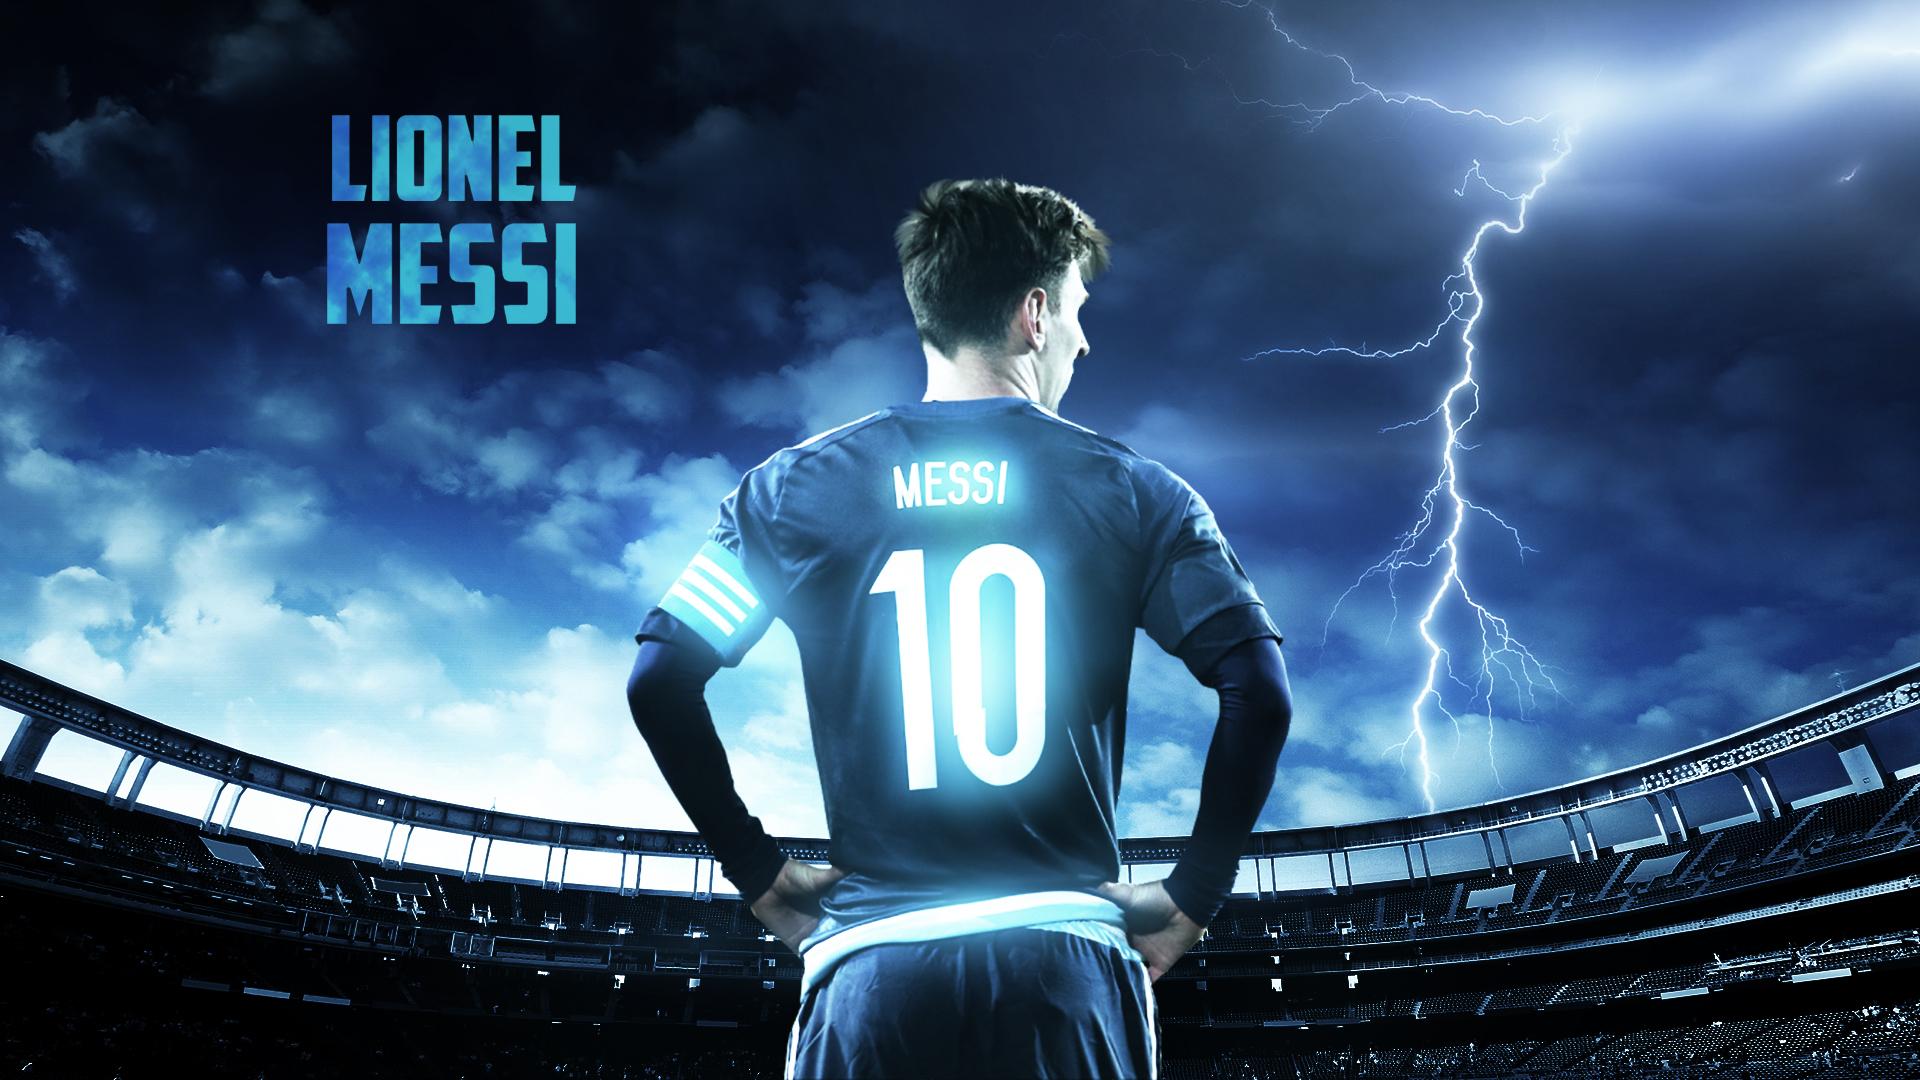 Lionel Messi 2015 Argentina Wallpaper by RakaGFX 1920x1080